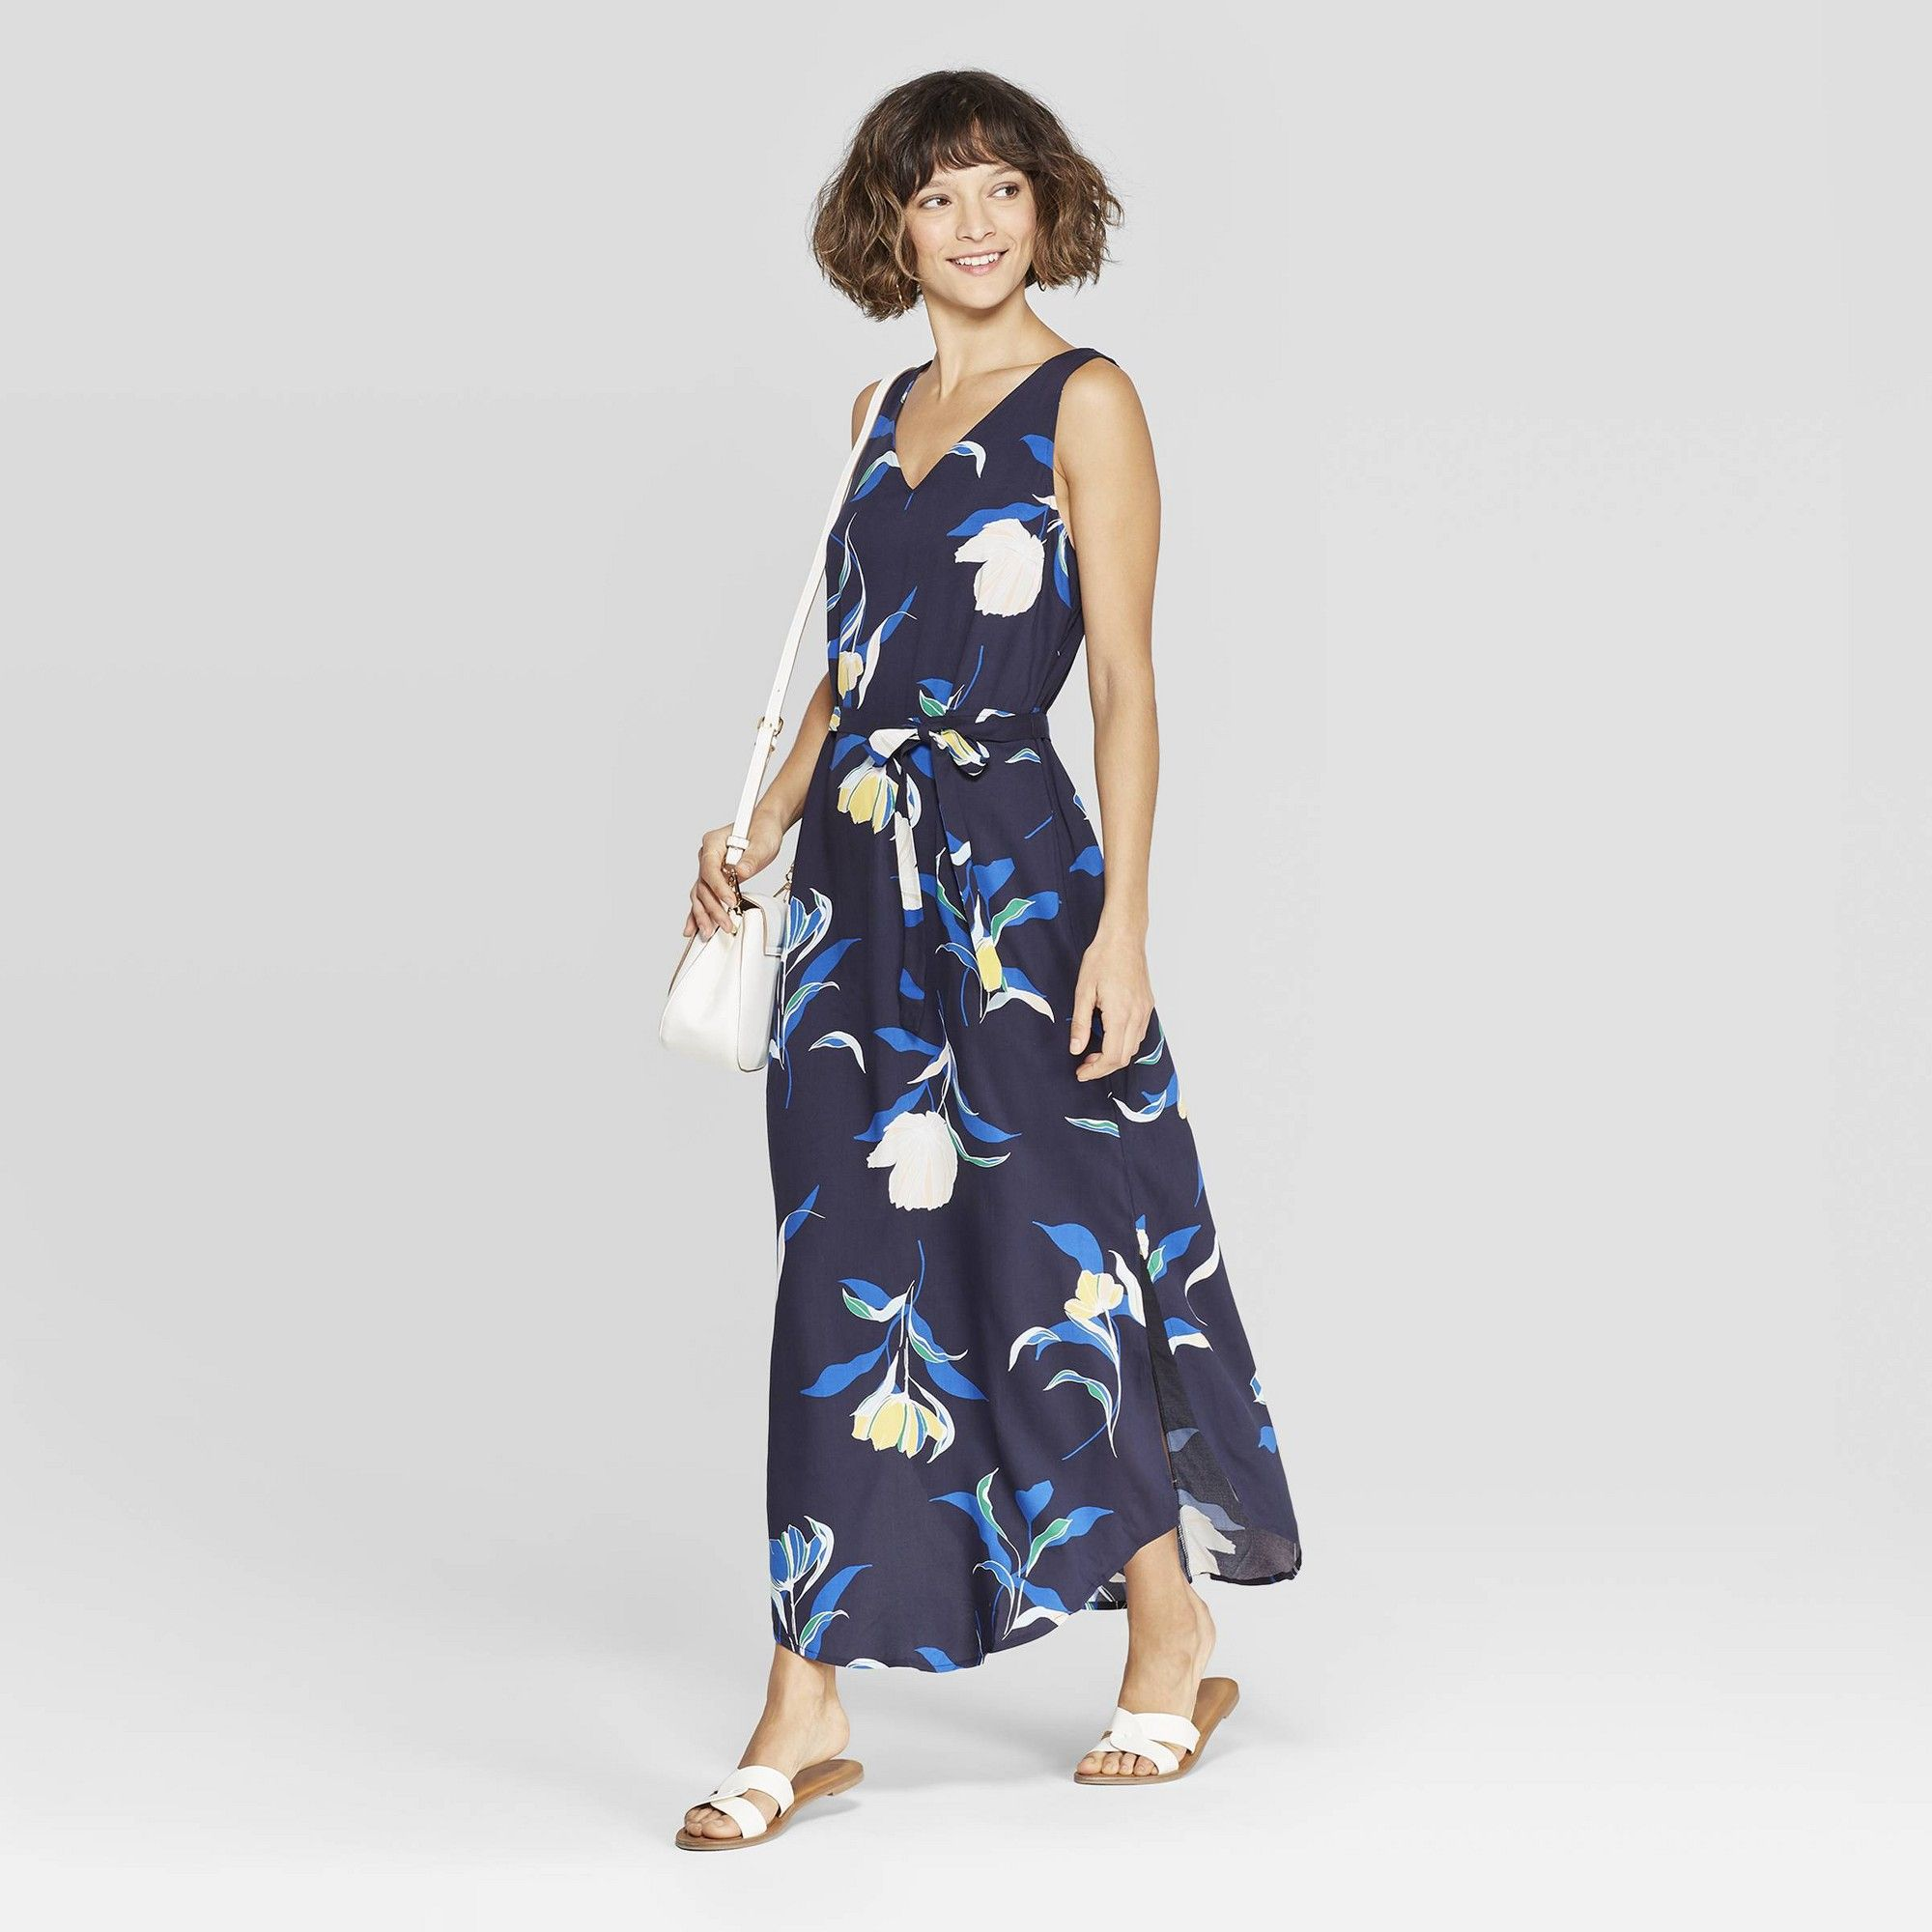 Women S Floral Print Sleeveless V Neck Maxi Dress A New Day Navy M Blue [ 2000 x 2000 Pixel ]